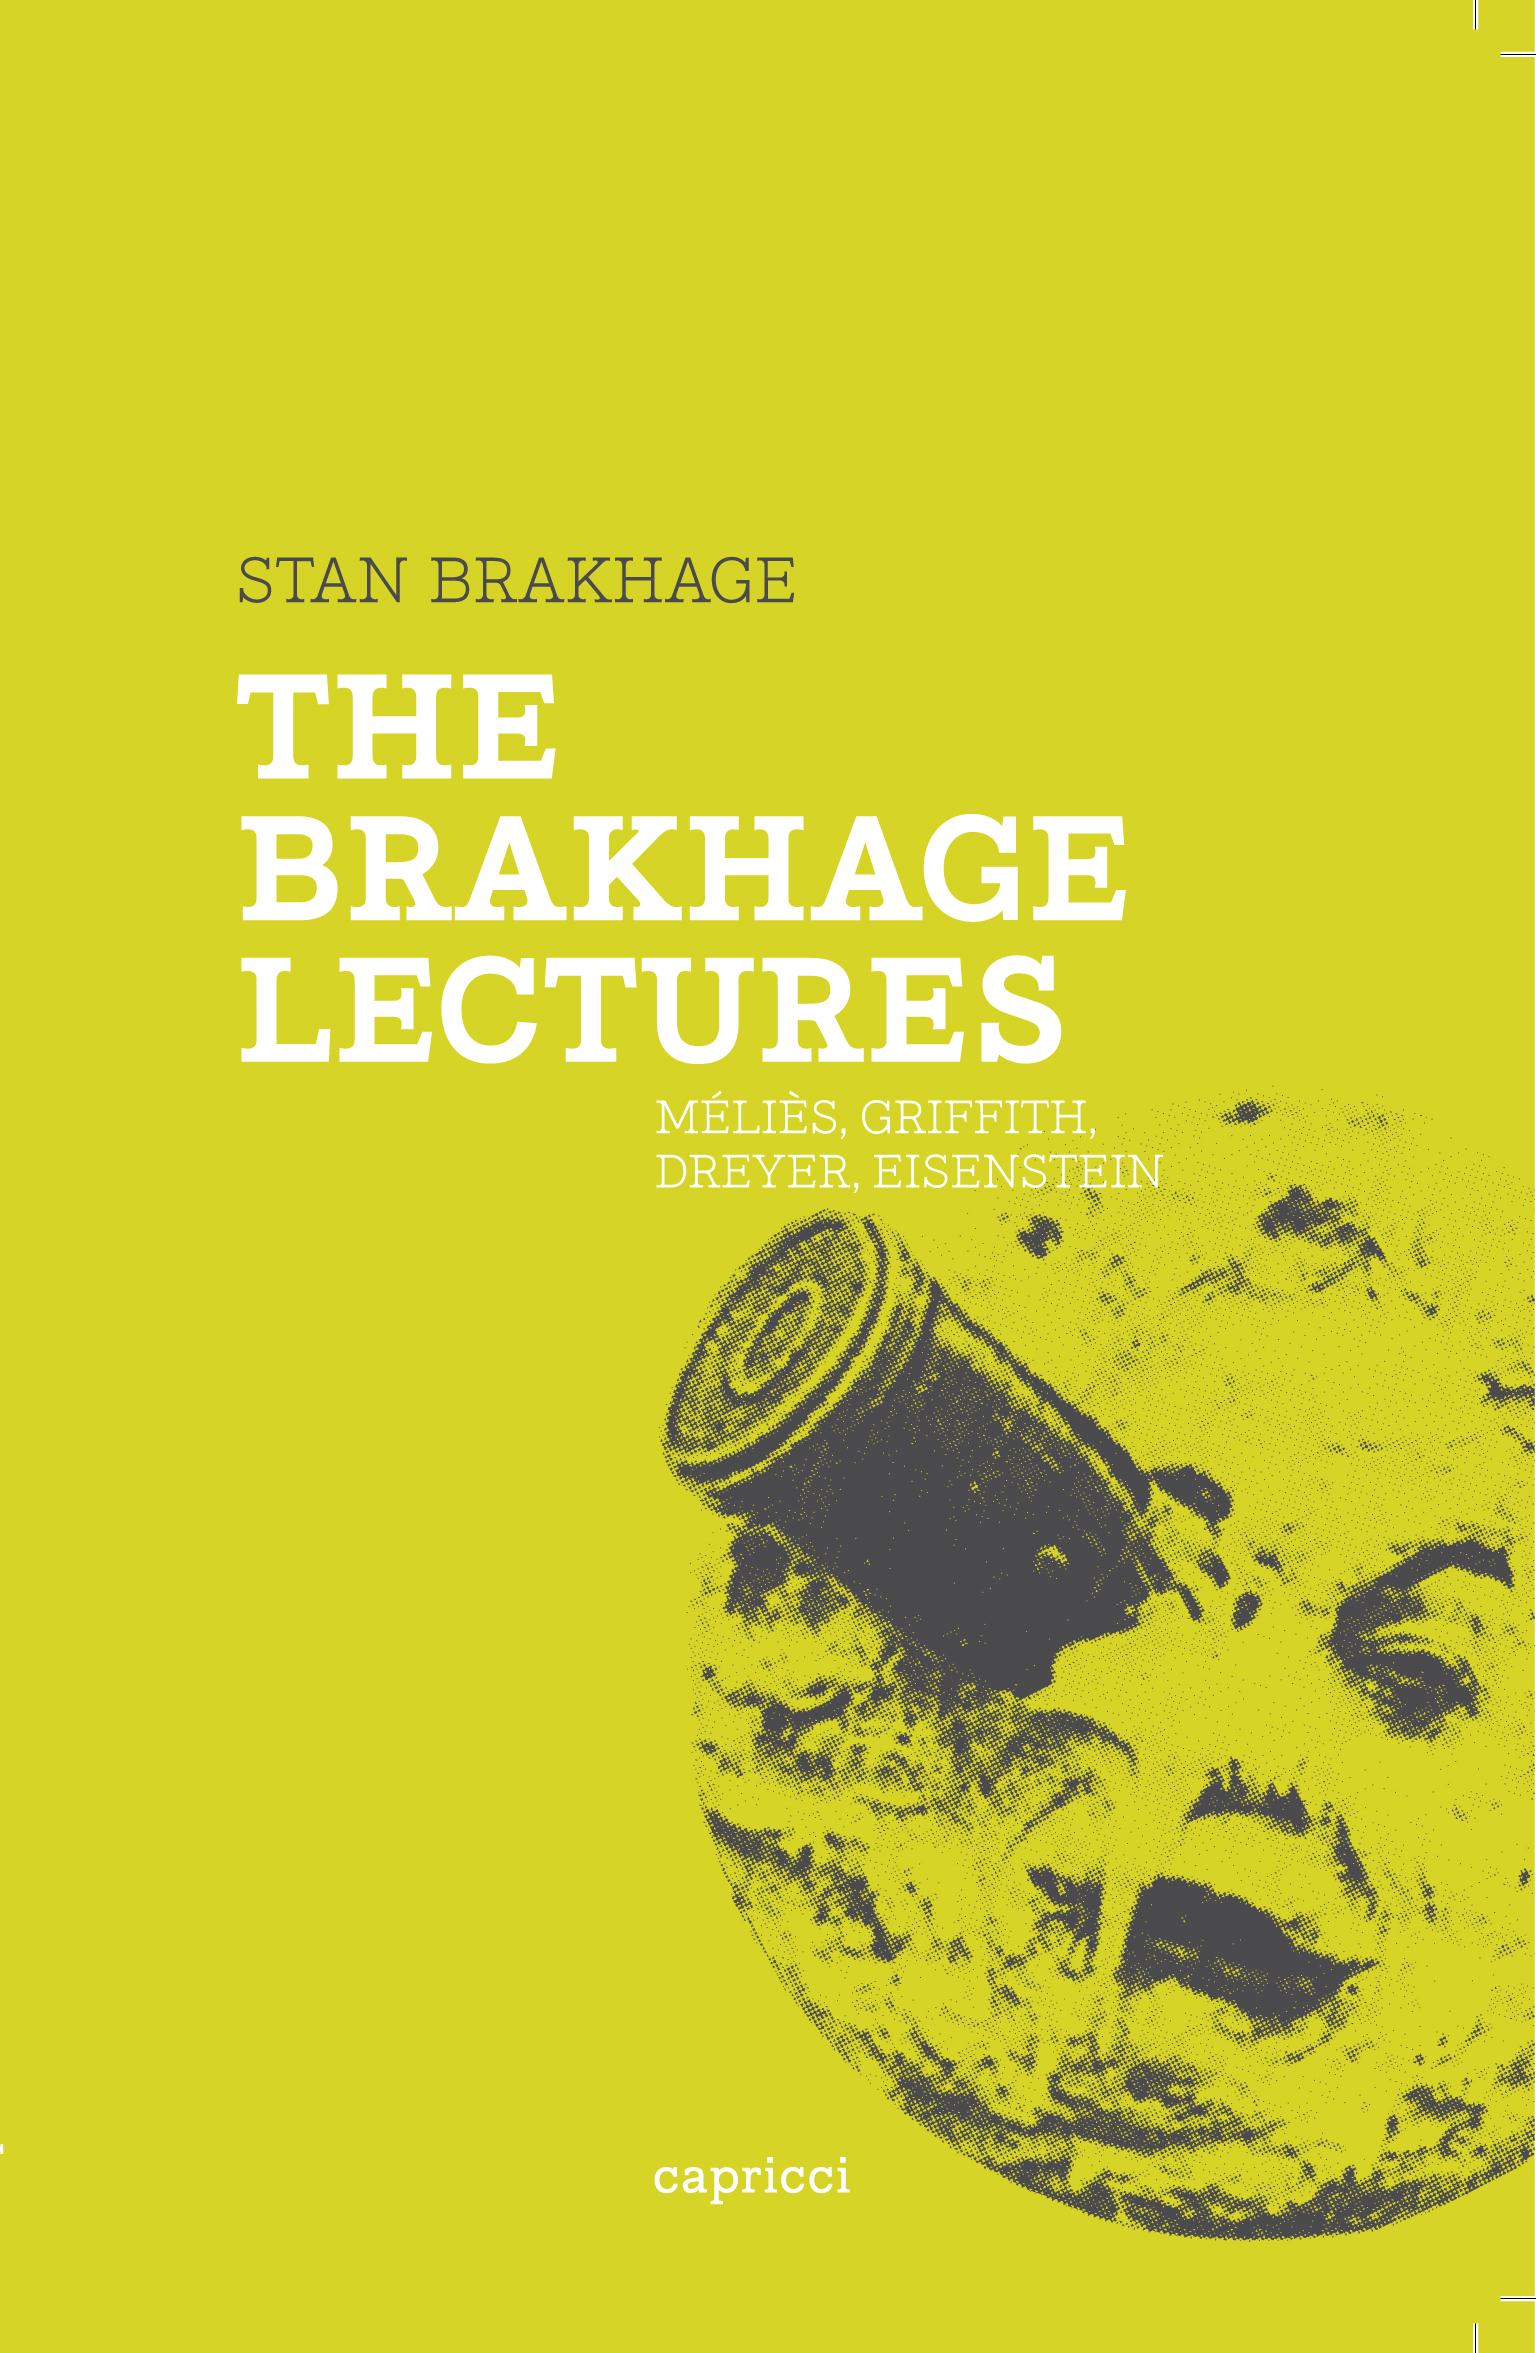 The Brakhage lectures